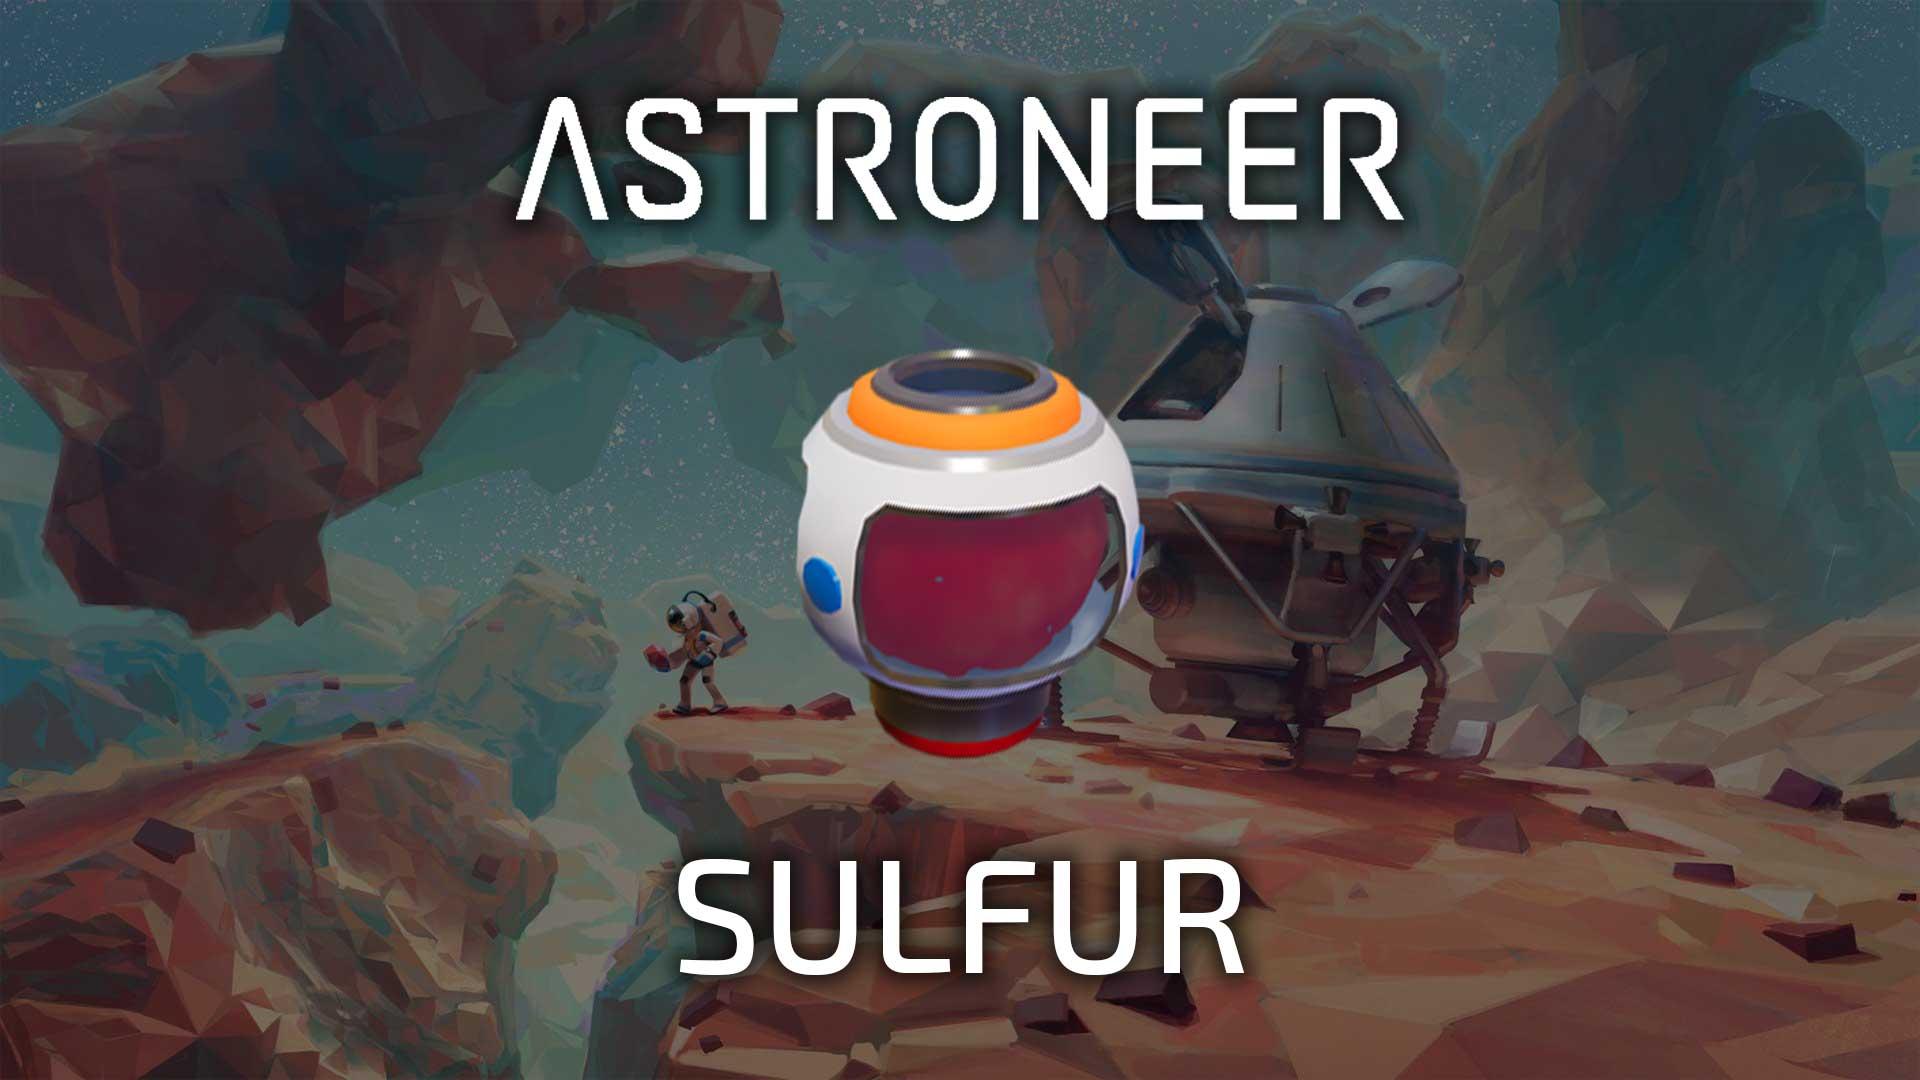 astroneer sulfur